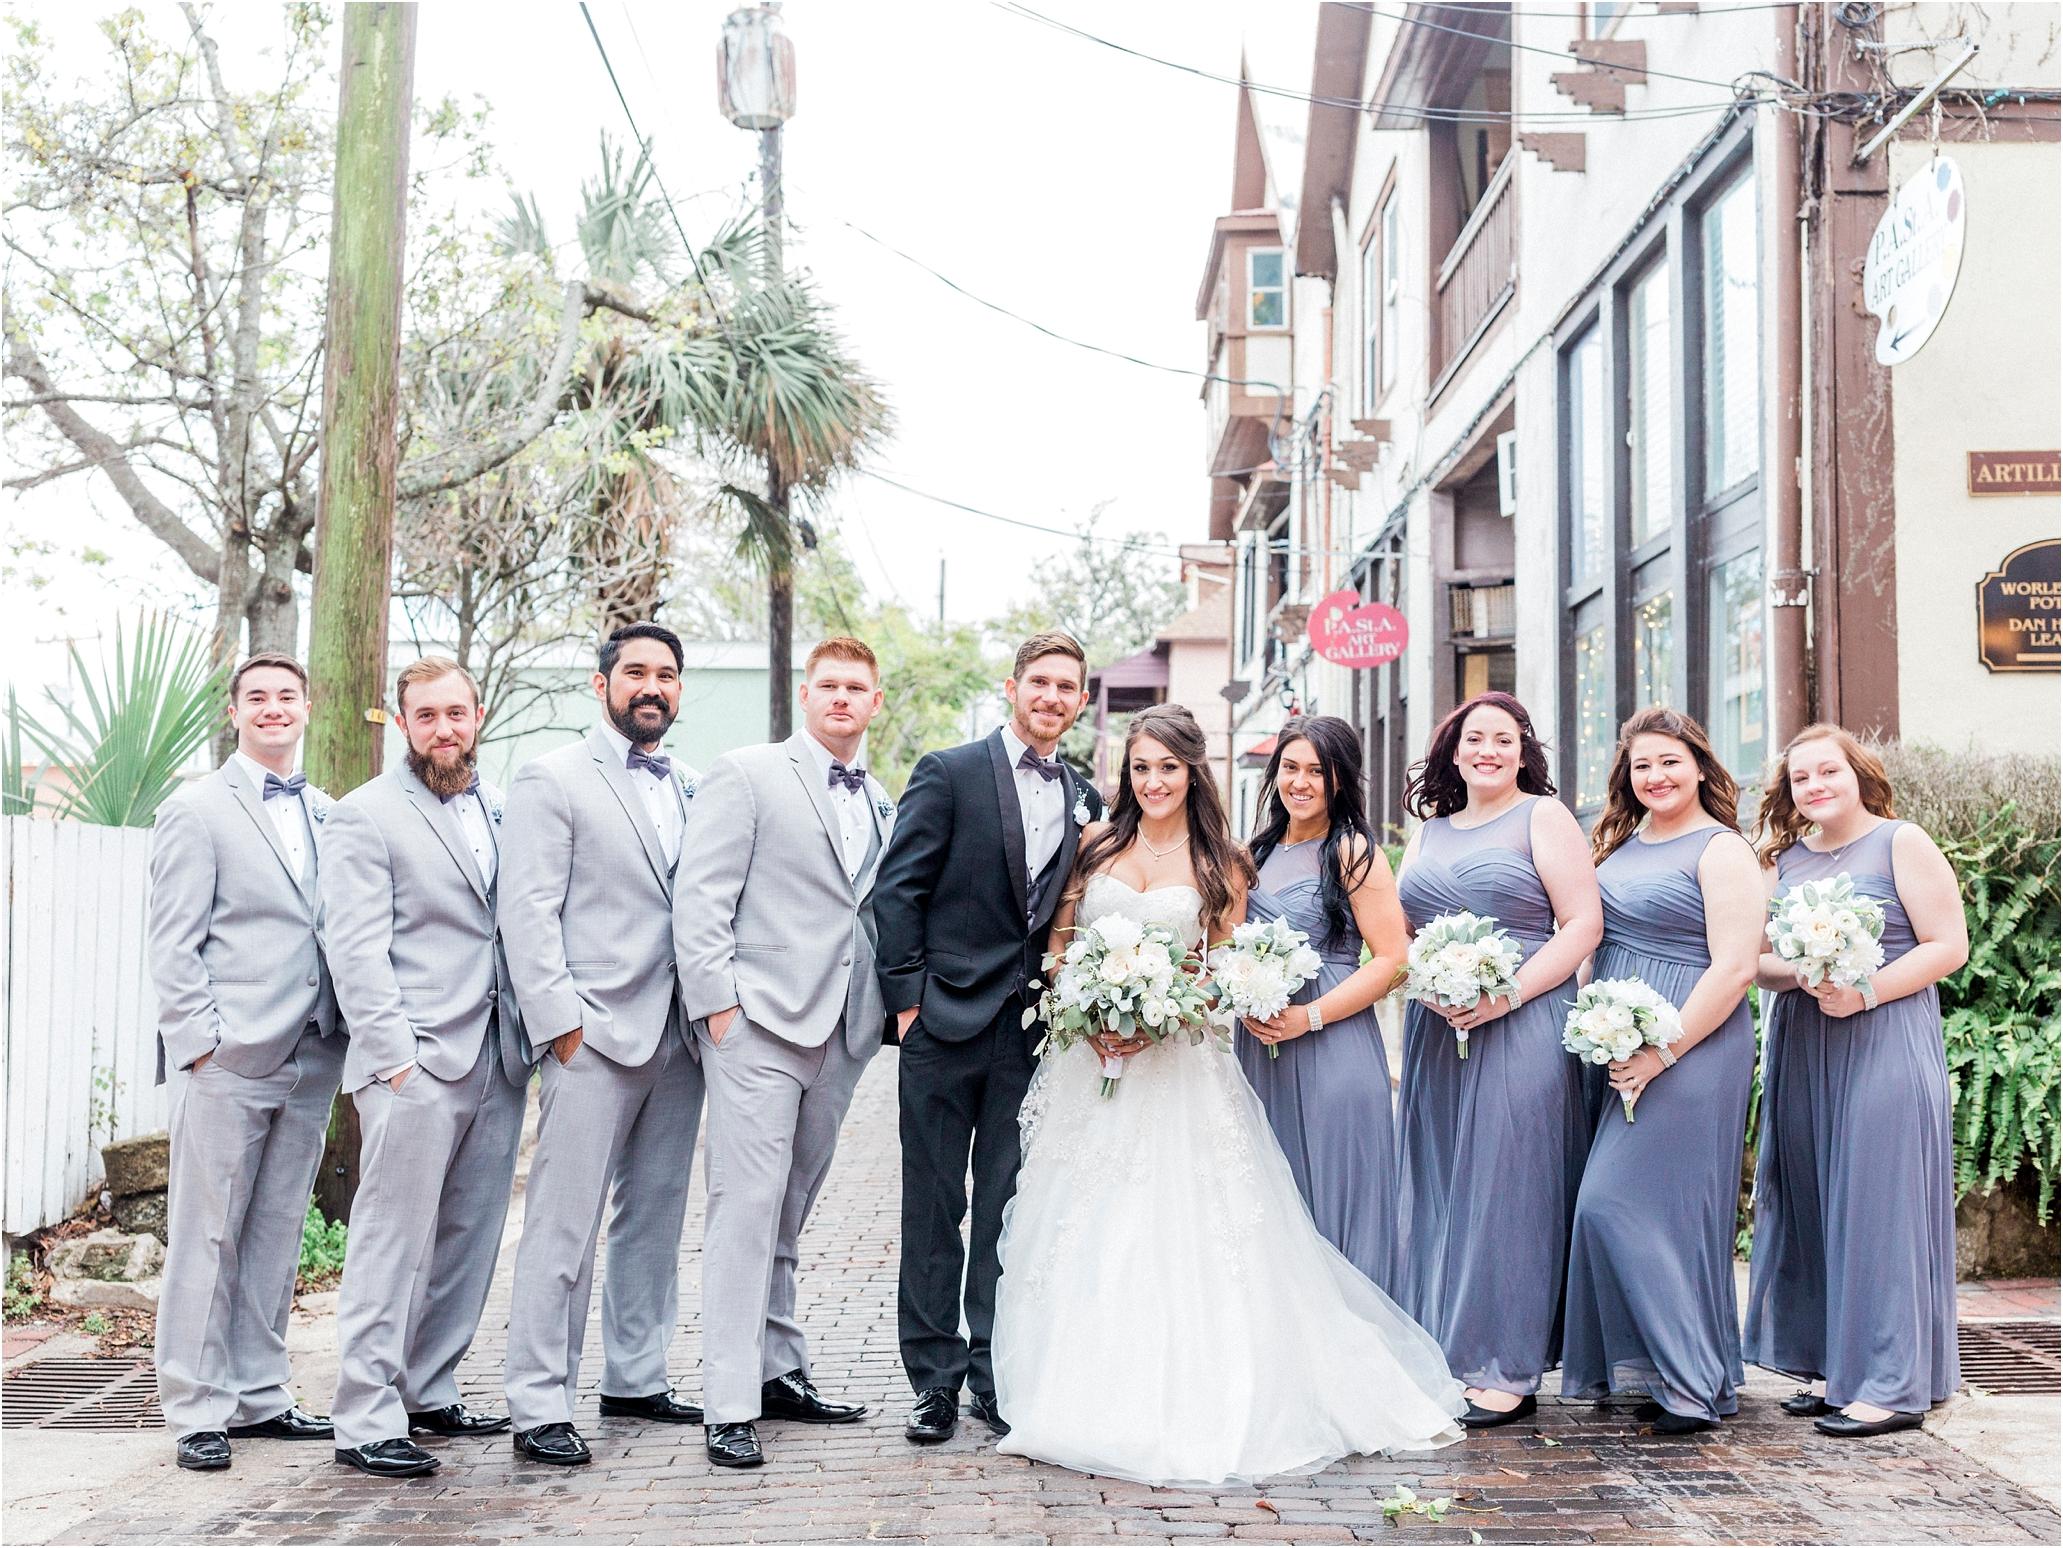 Lisa Silva Photography- Ponte Vedra Beach and Jacksonville, Florida Fine Art Film Wedding Photography- Wedding at The White Room Villa Blanca in St. Augustine, Florida_0056.jpg